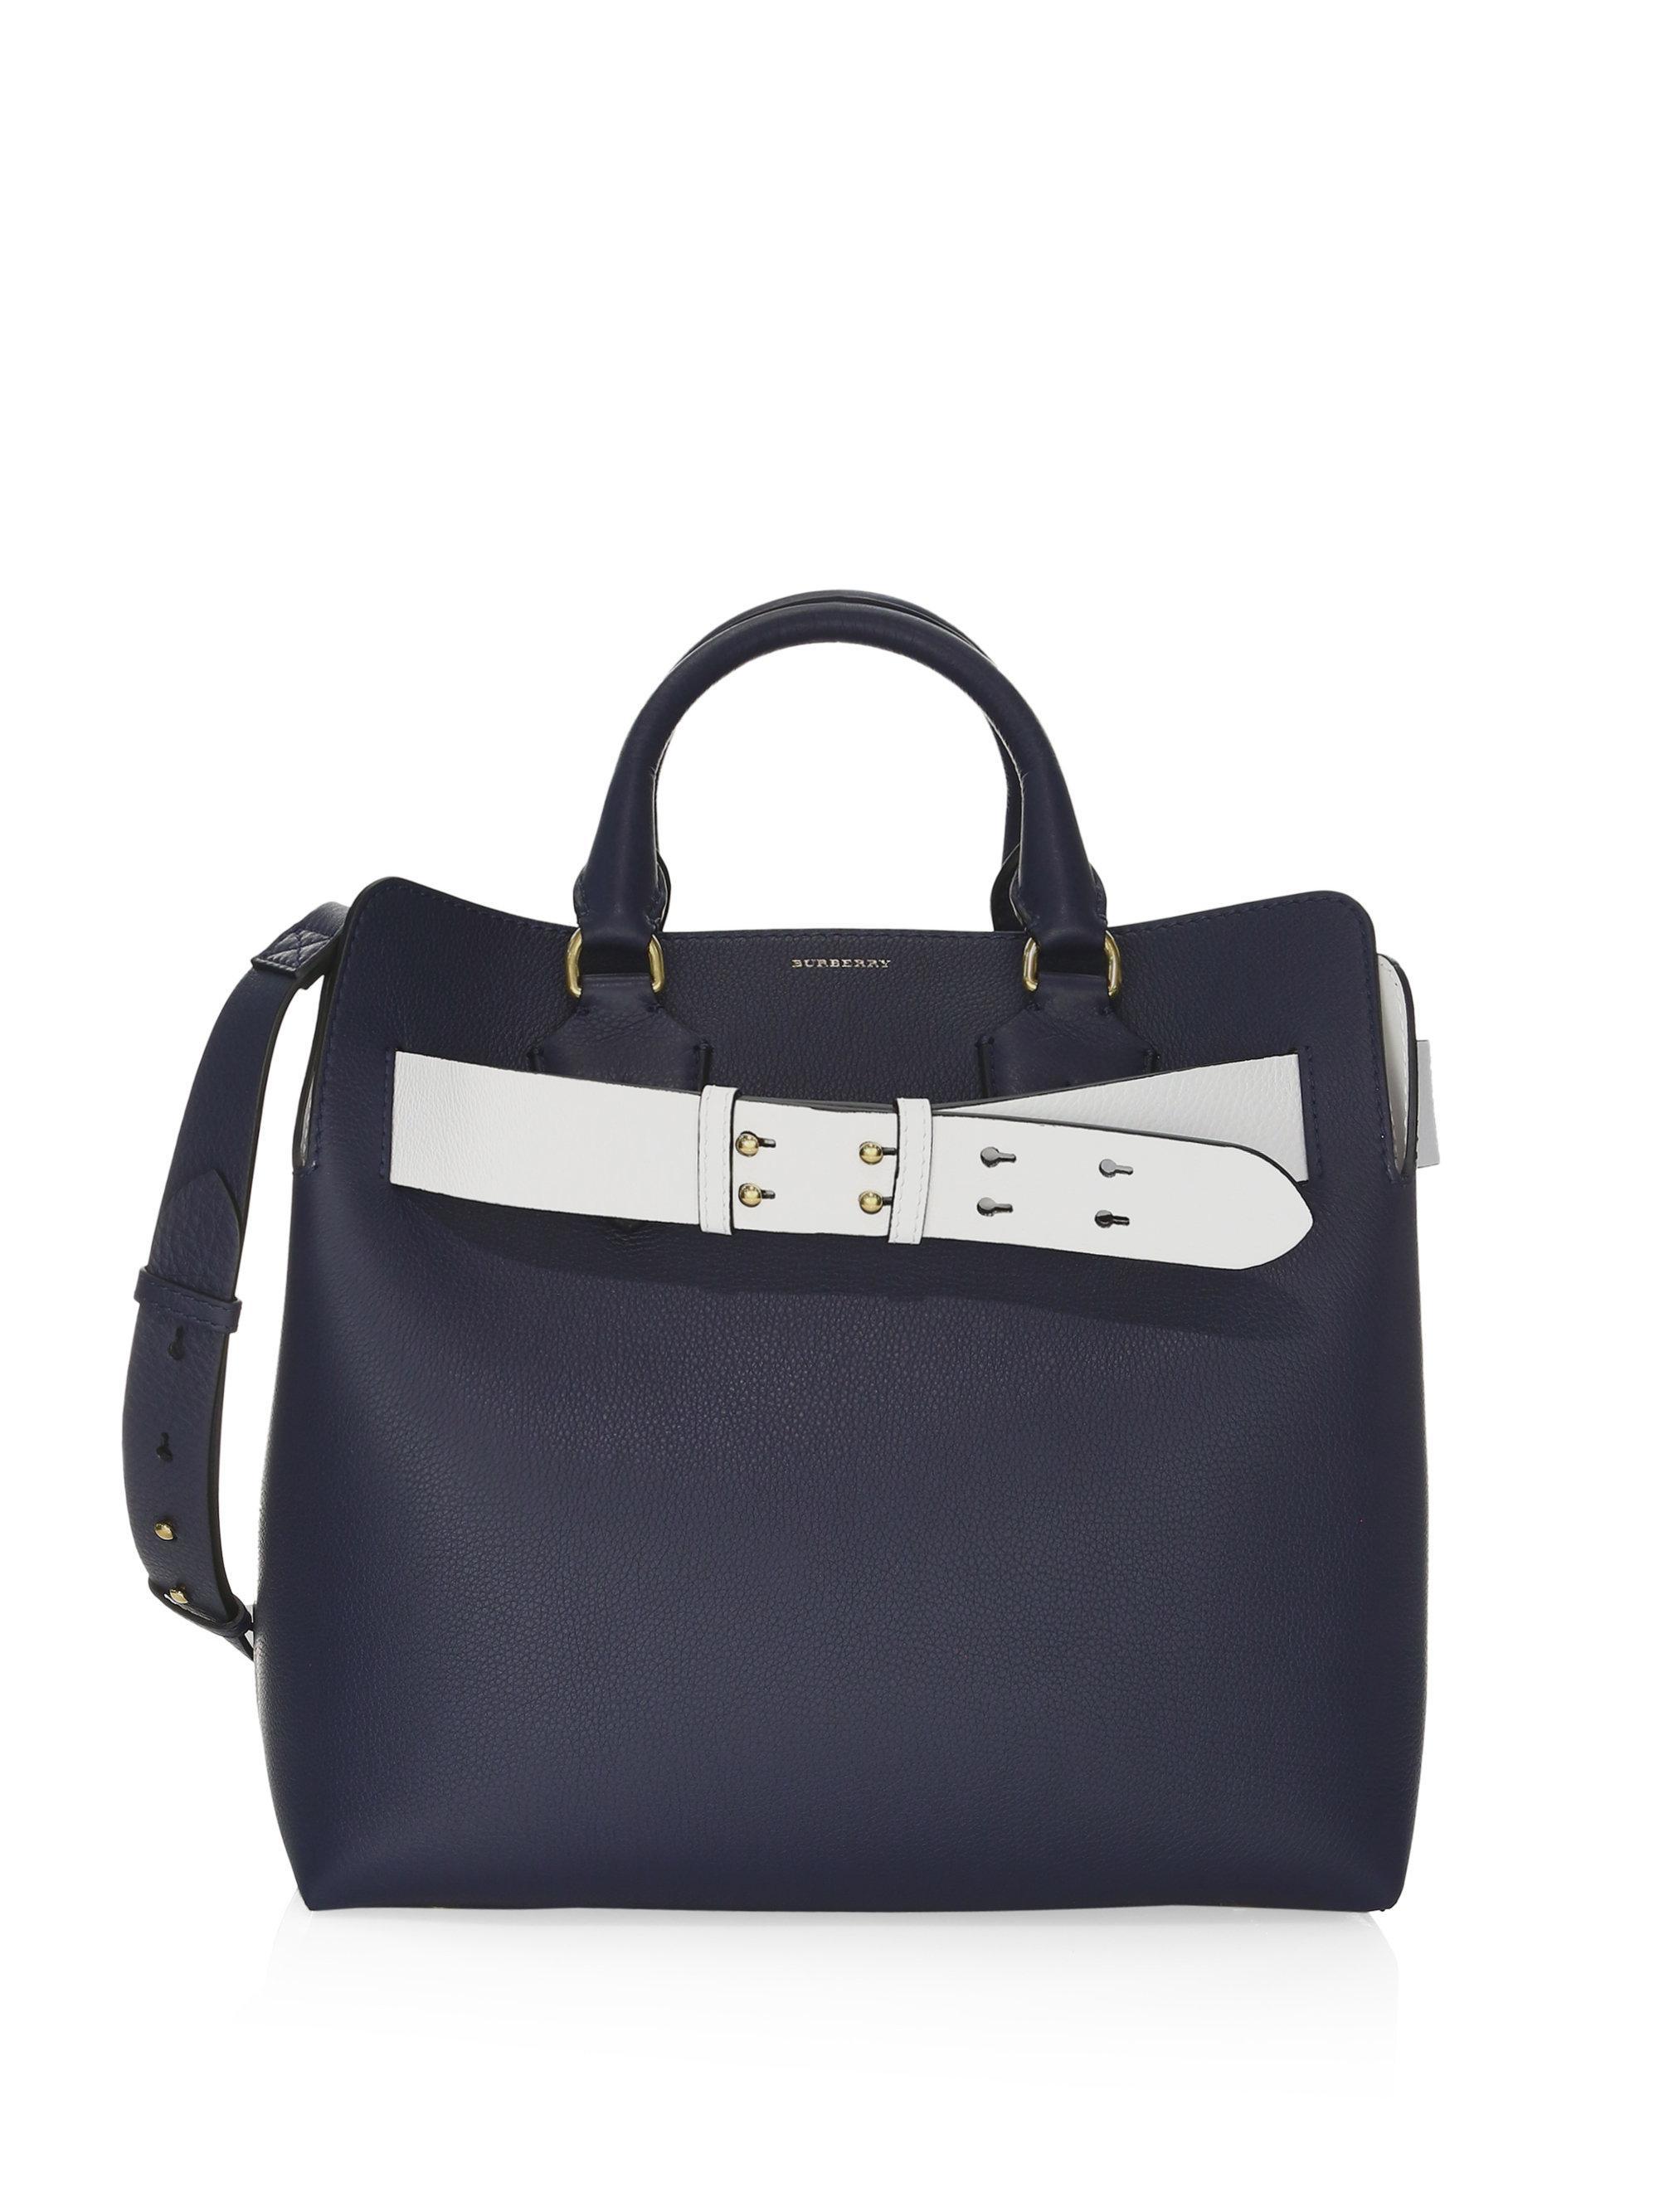 Belt Bag Medium in Mineral Grey Marais Leather Burberry Q8FKJS0zm